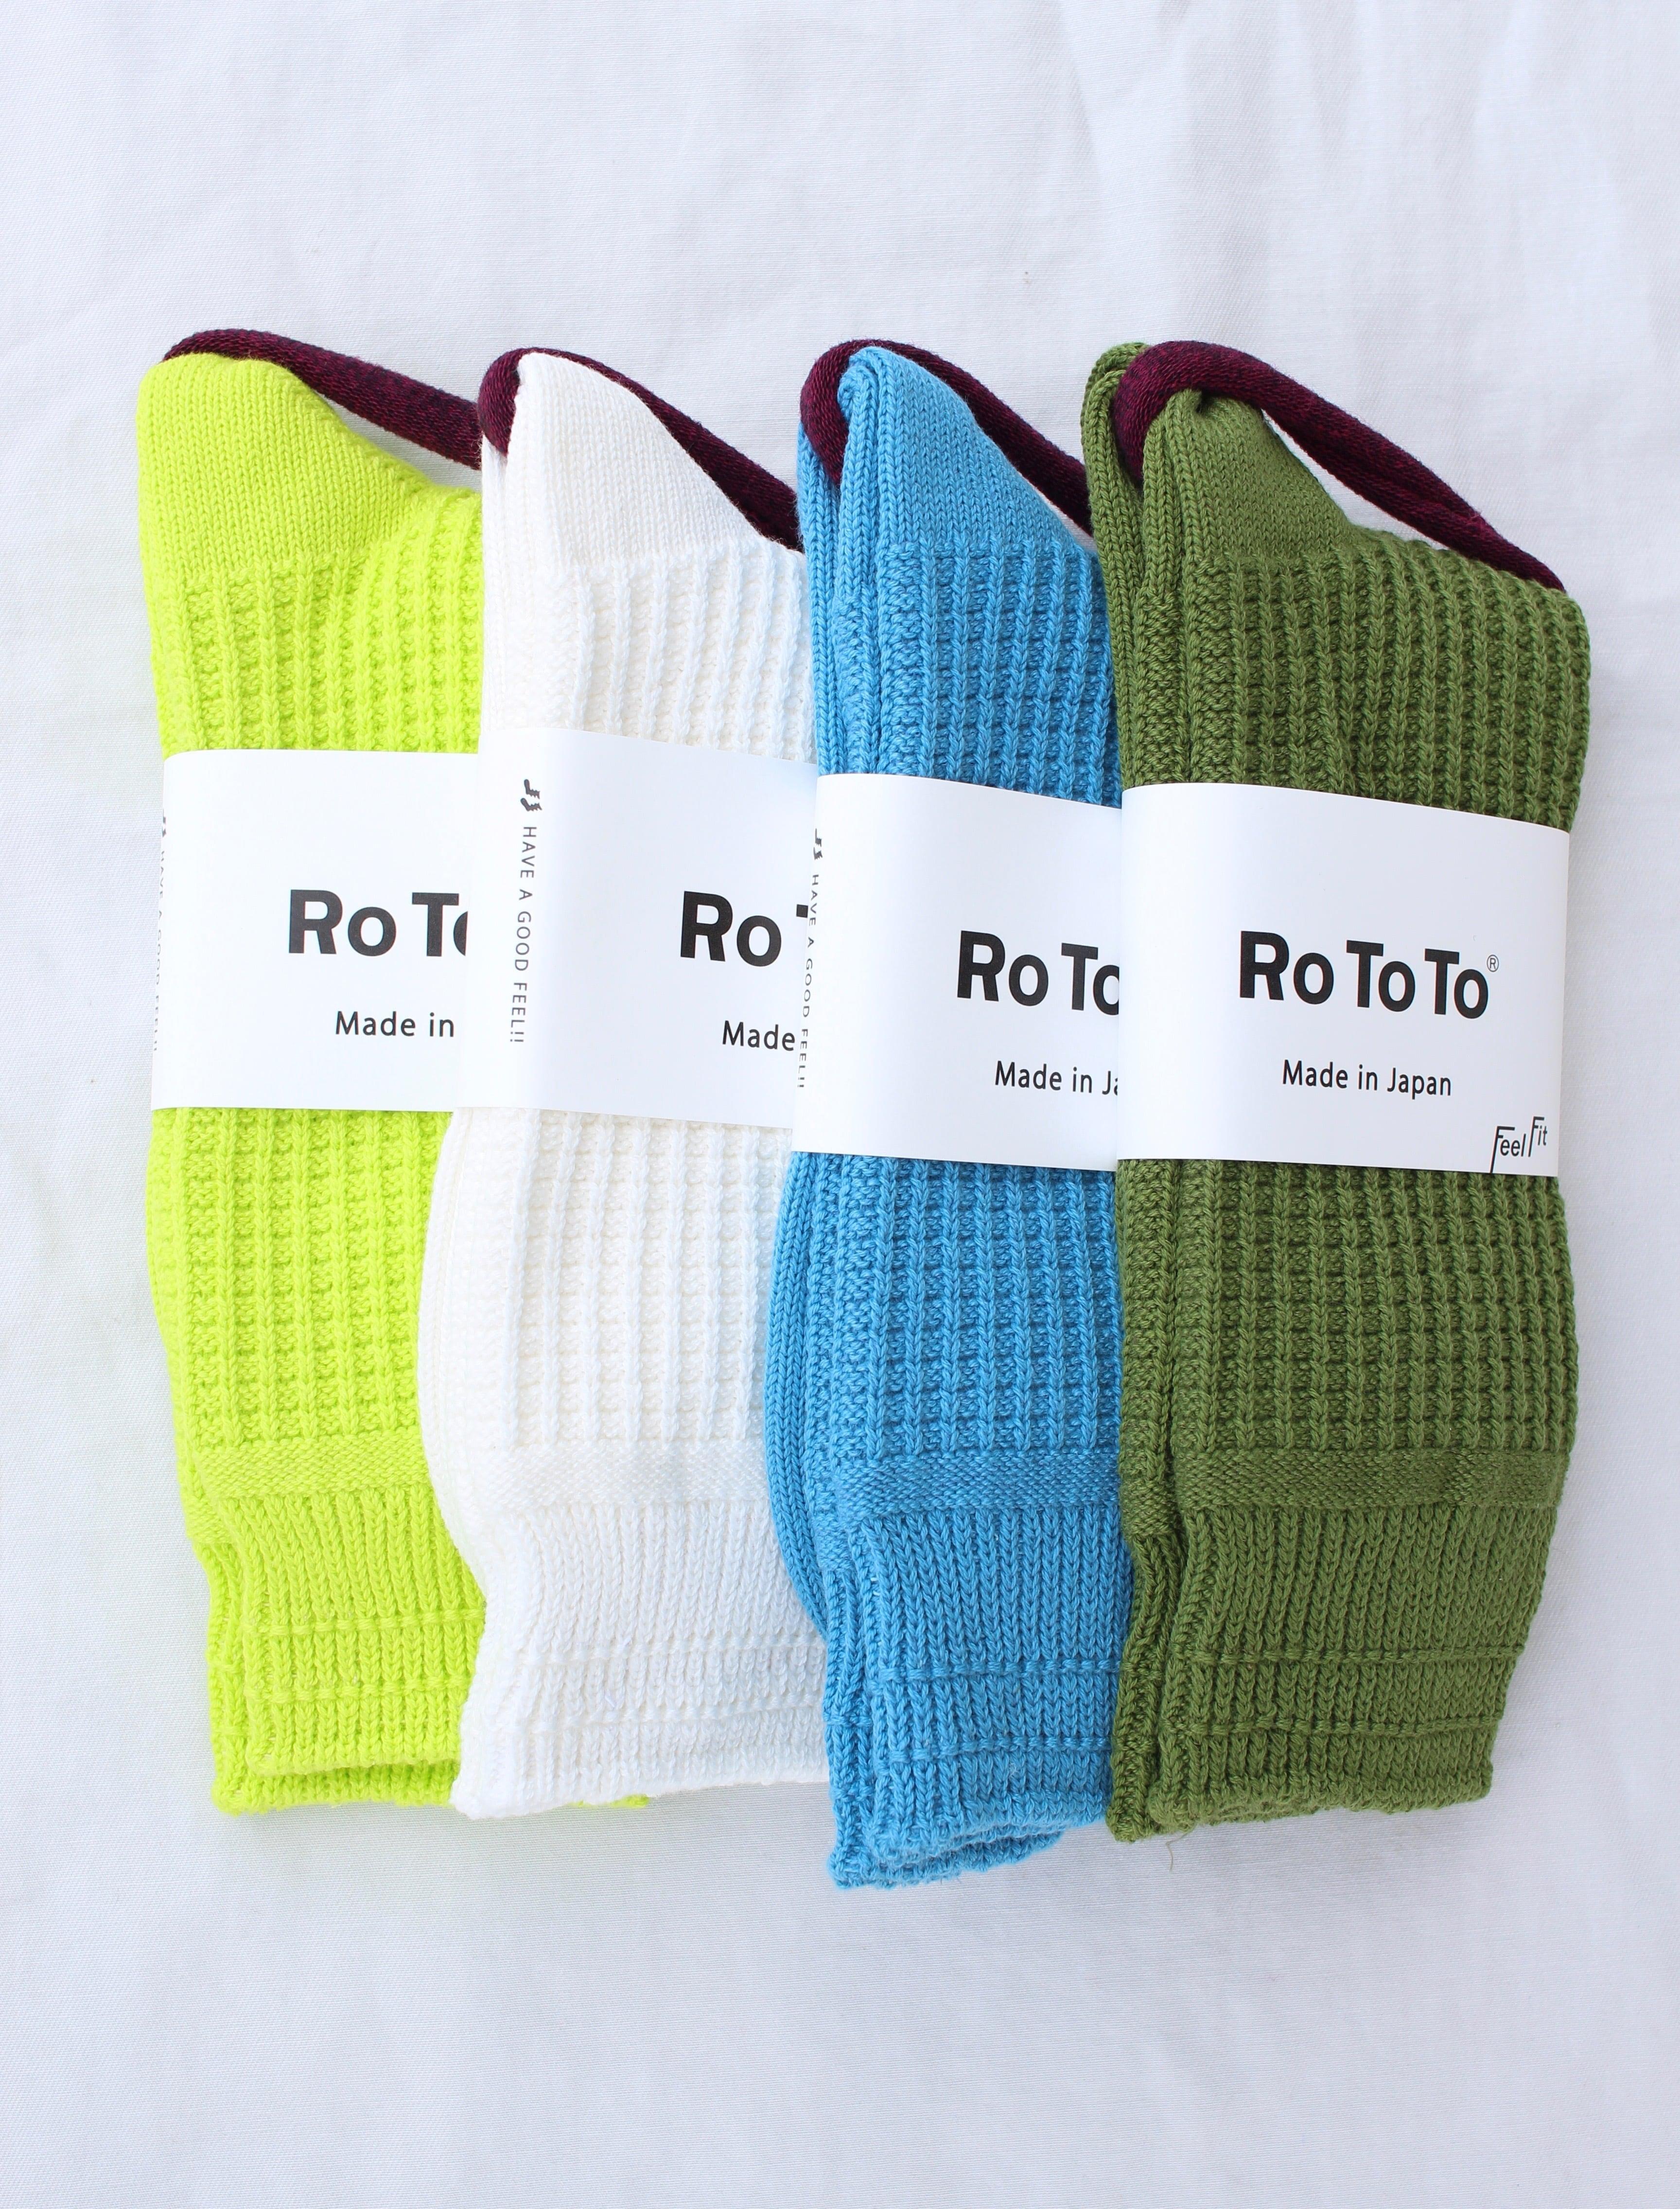 ROTOTO(ロトト)/ Cotton Waffle Socks(コットンワッフルソックス)